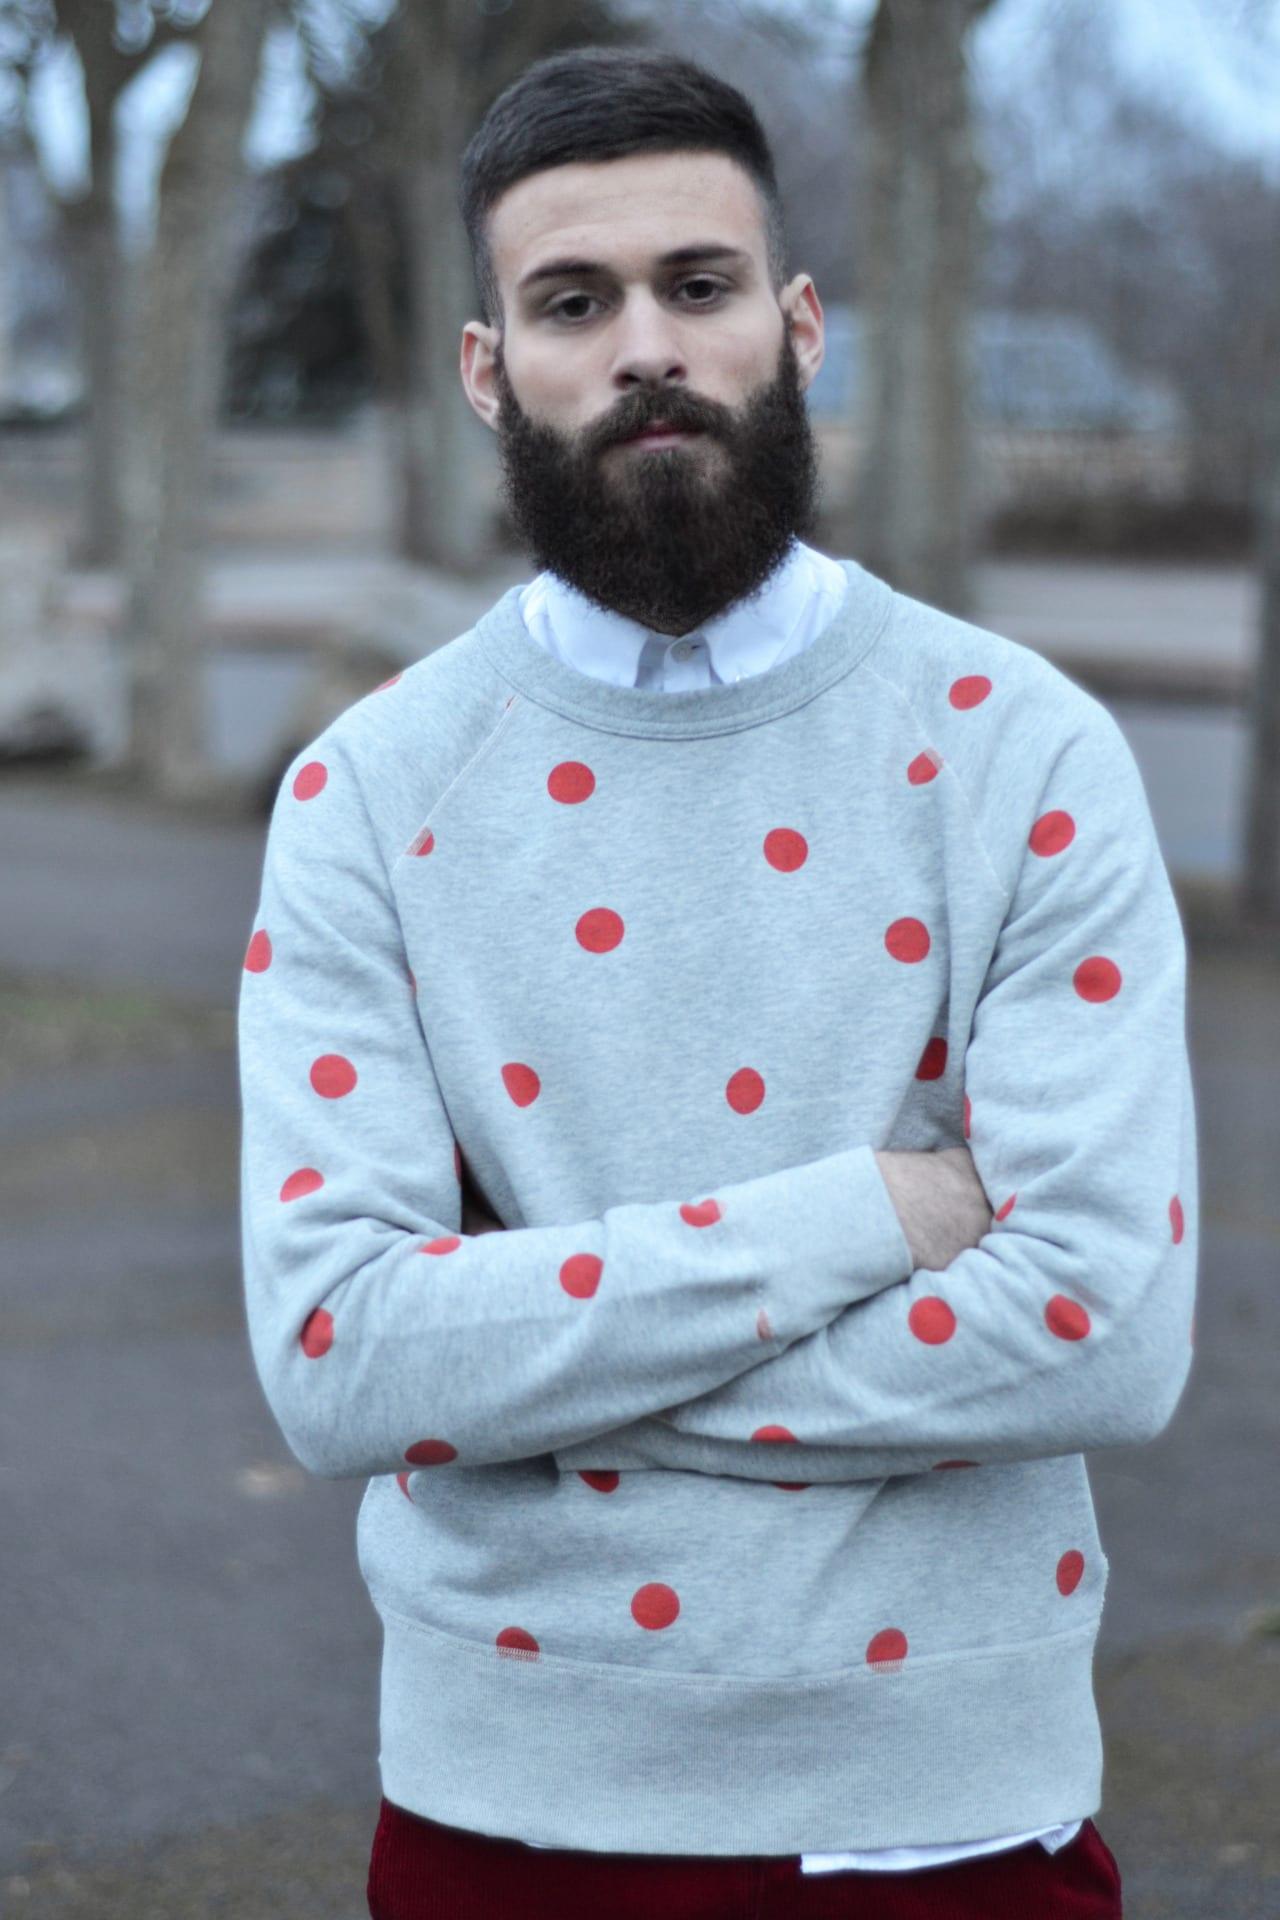 full-beard-faded-hairstyle